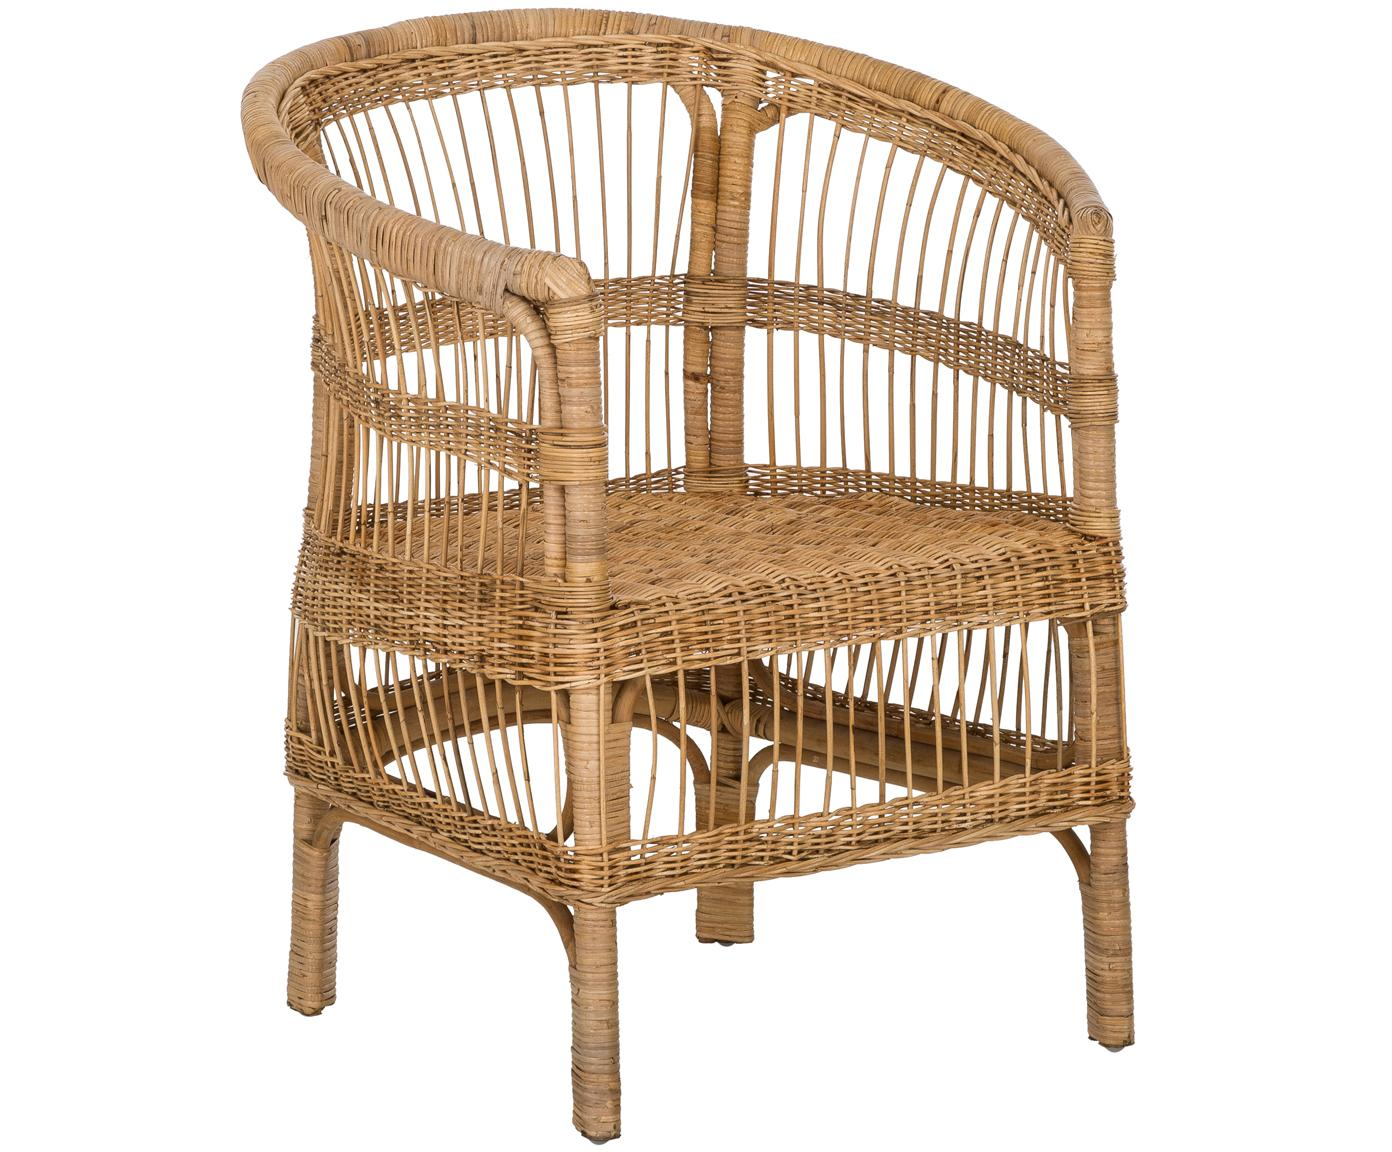 Sedia con braccioli in vimini  Palma, Rattan, Rattan, Larg. 60 x Alt. 70 cm